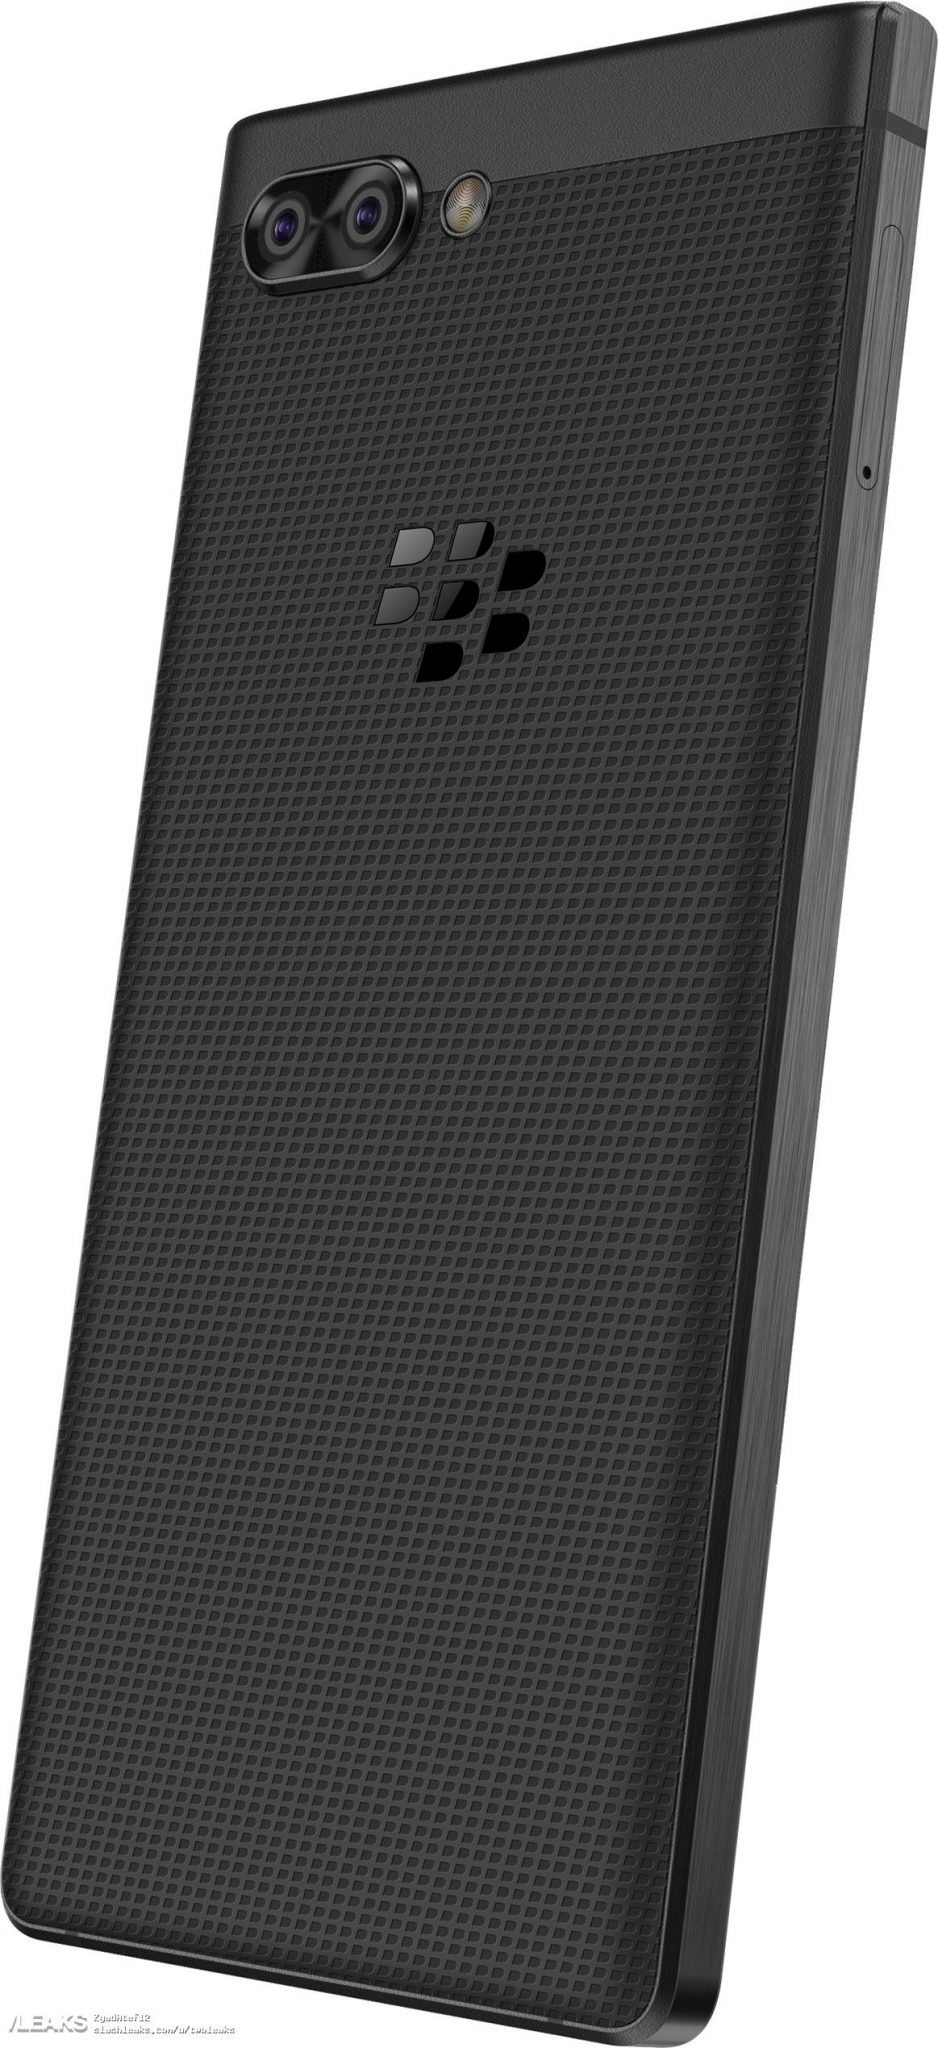 Blackberry KeyTwo (Athena) renders reveal Qwerty keyboard & dual cameras 4